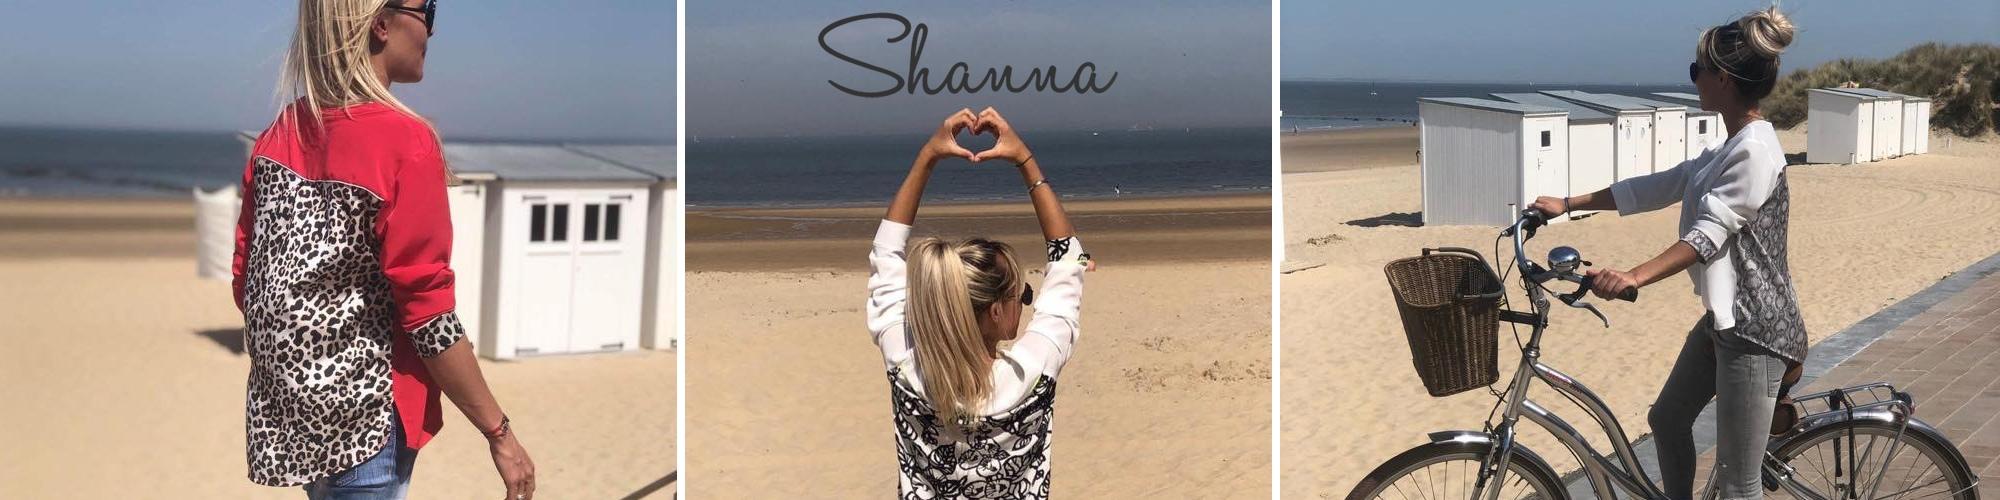 Blouses Shanna